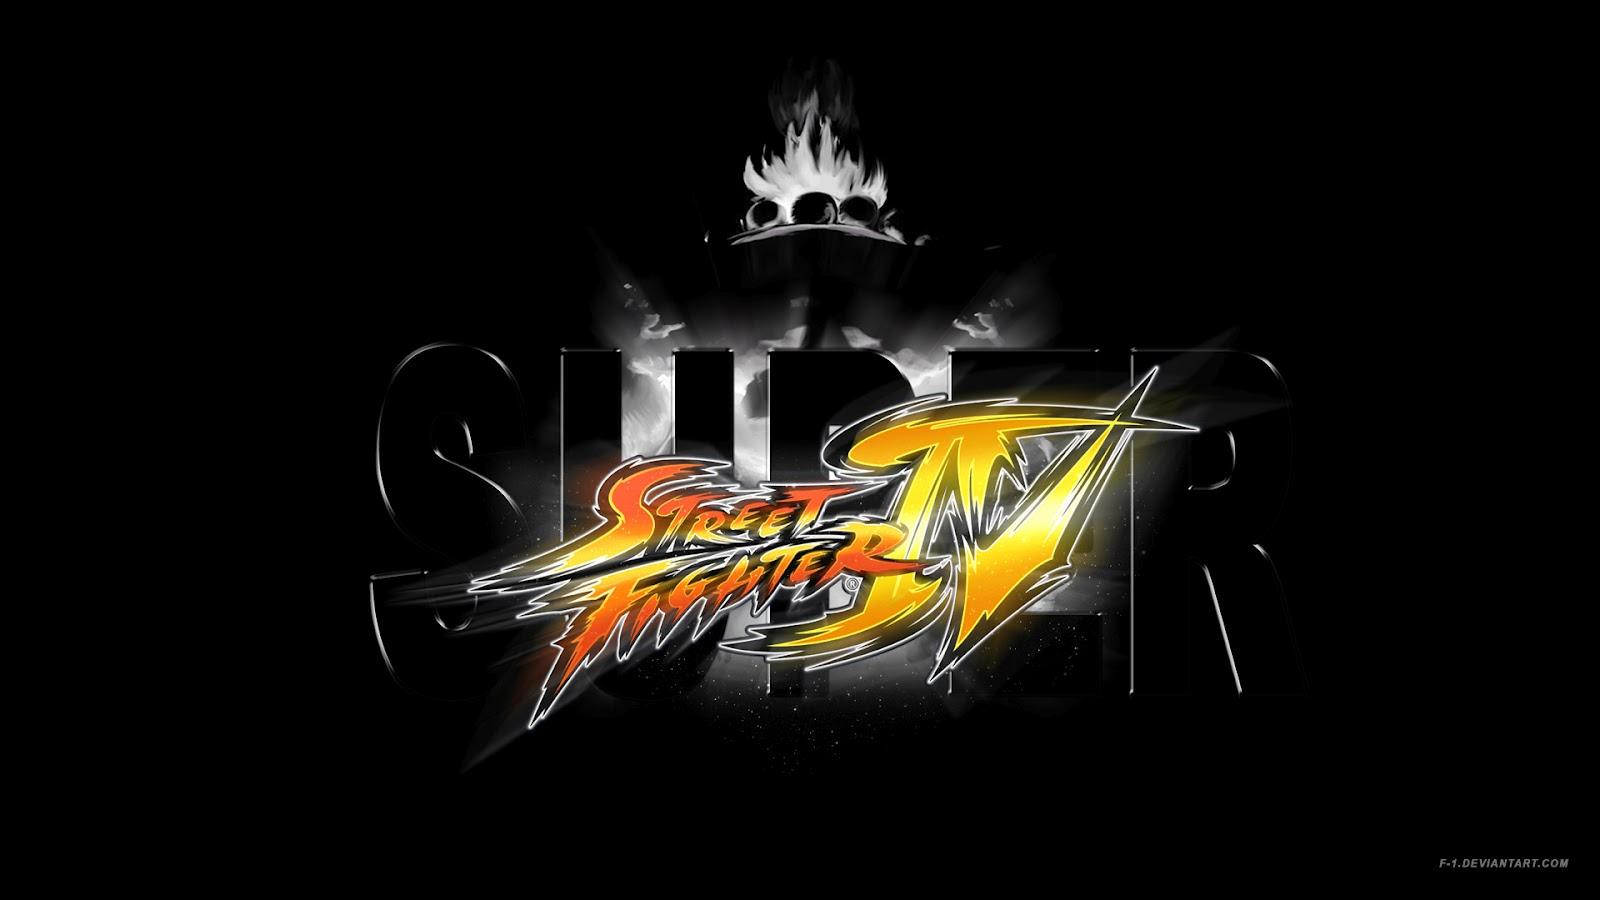 http://3.bp.blogspot.com/-gFMf2ib94nk/T3yPHMjgoMI/AAAAAAAAARw/E7eOvJggSls/s1600/Super_Street_Fighter_IV_Akuma_by_F_1.jpg